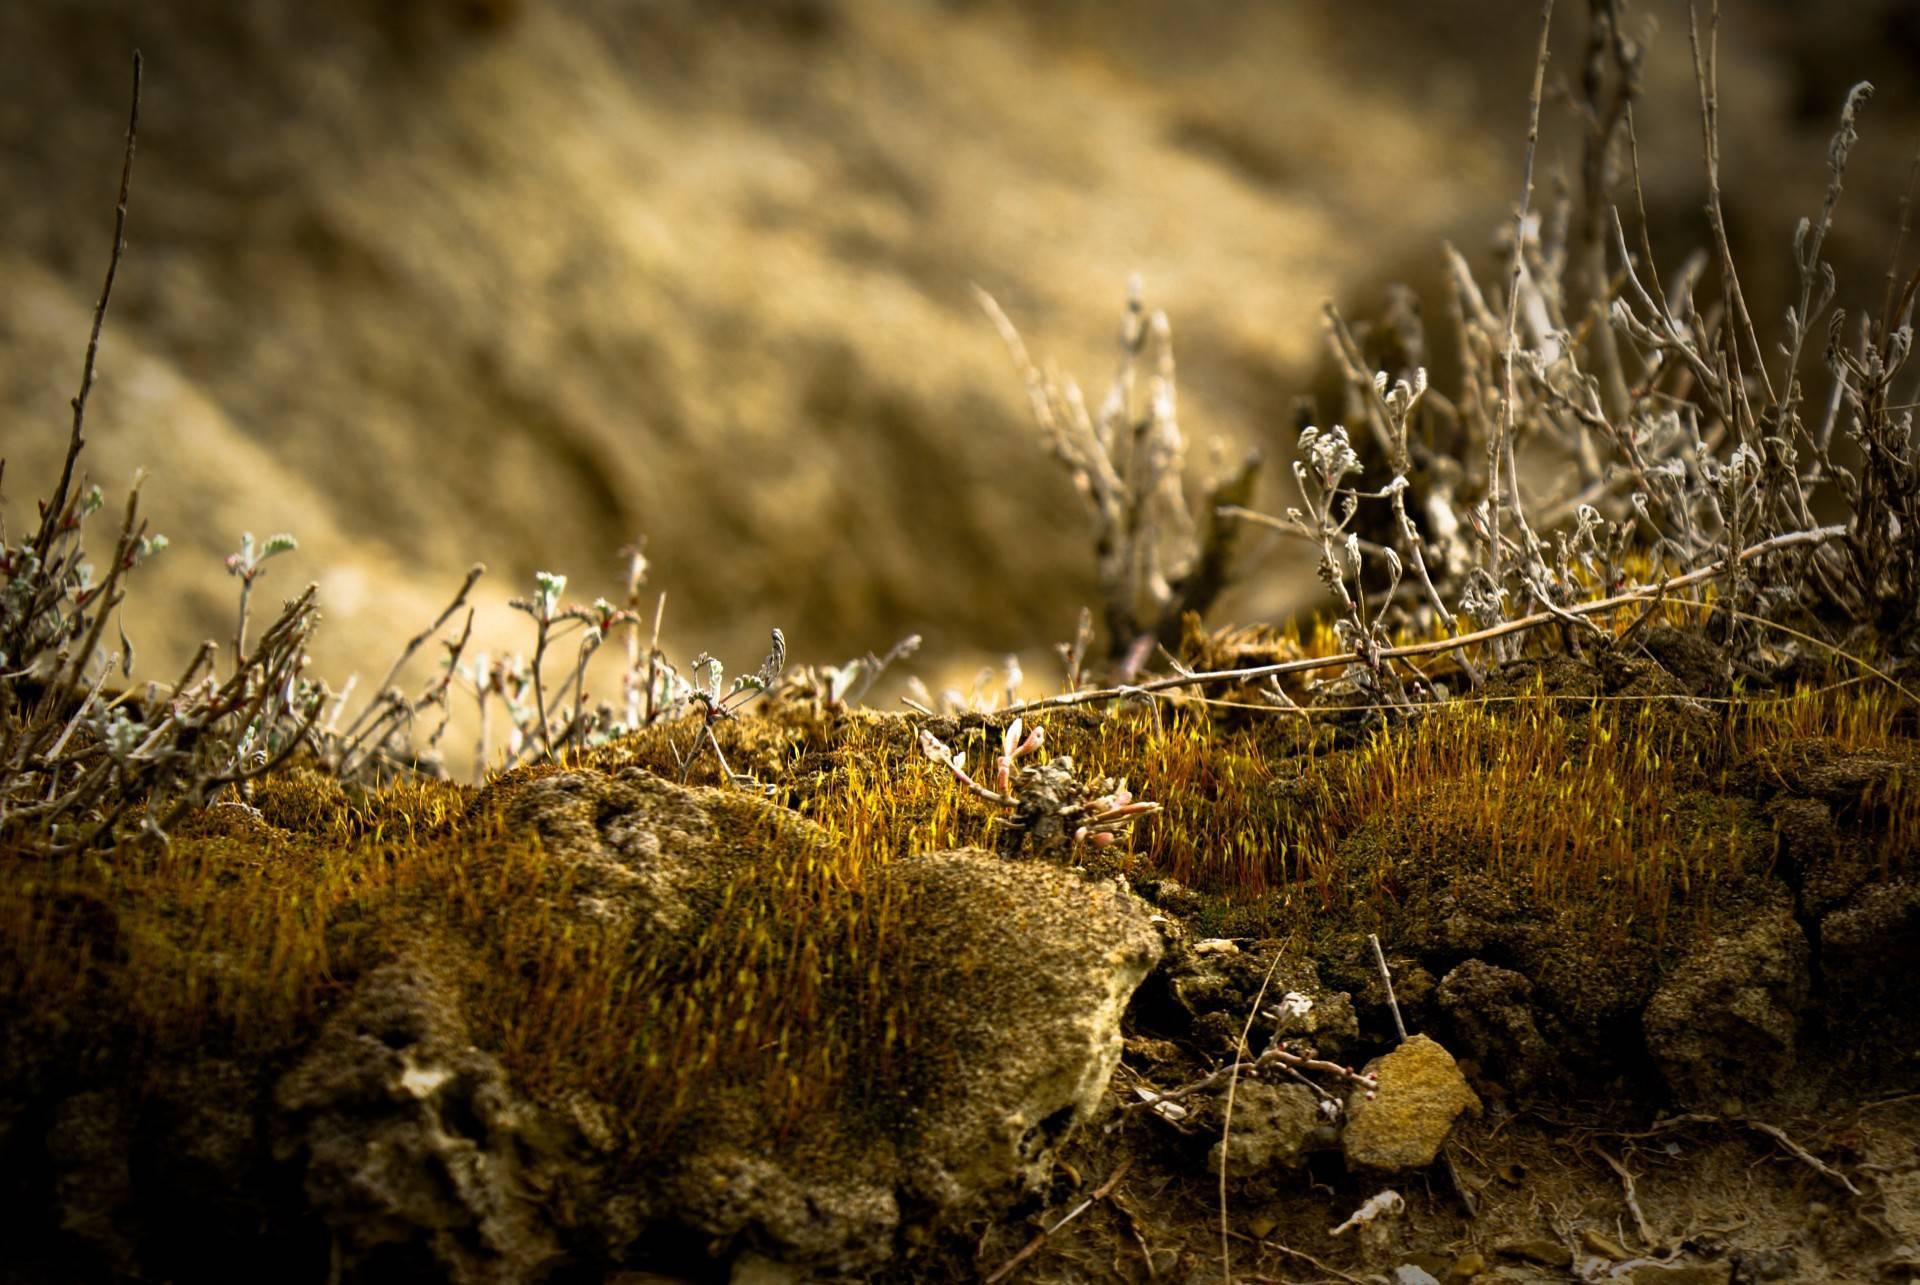 Depth Photo 3d Live Wallpaper Download Depth Of Field Nature Hd Desktop Wallpapers 4k Hd